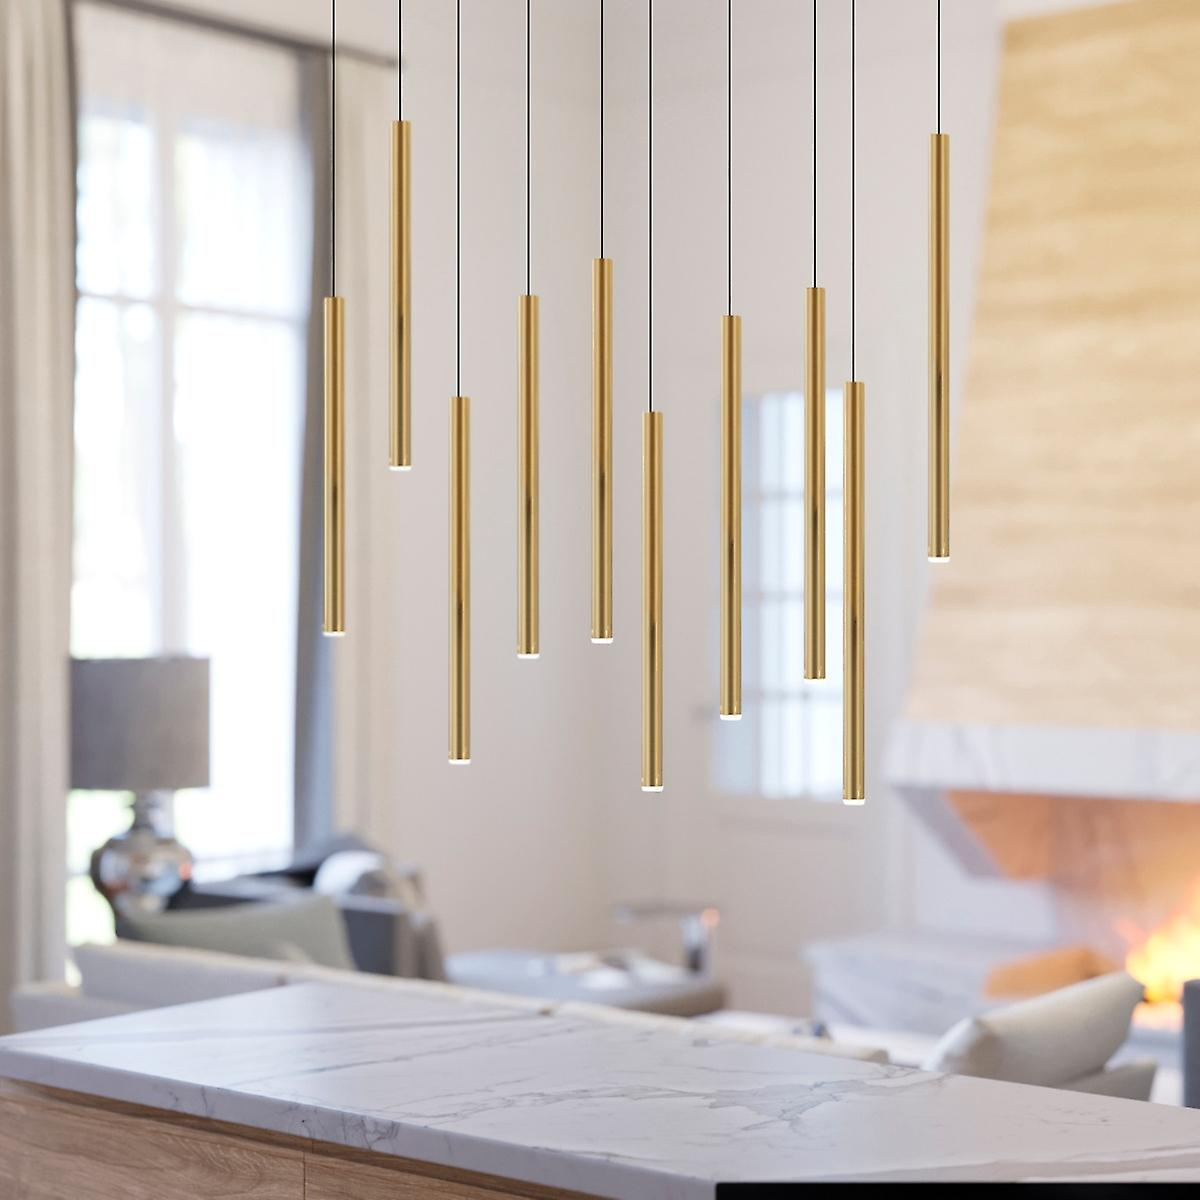 Pendant Lighting Kitchen Lamp Bedroom Ceiling Lights 10 Pendants Rectangular Canopy